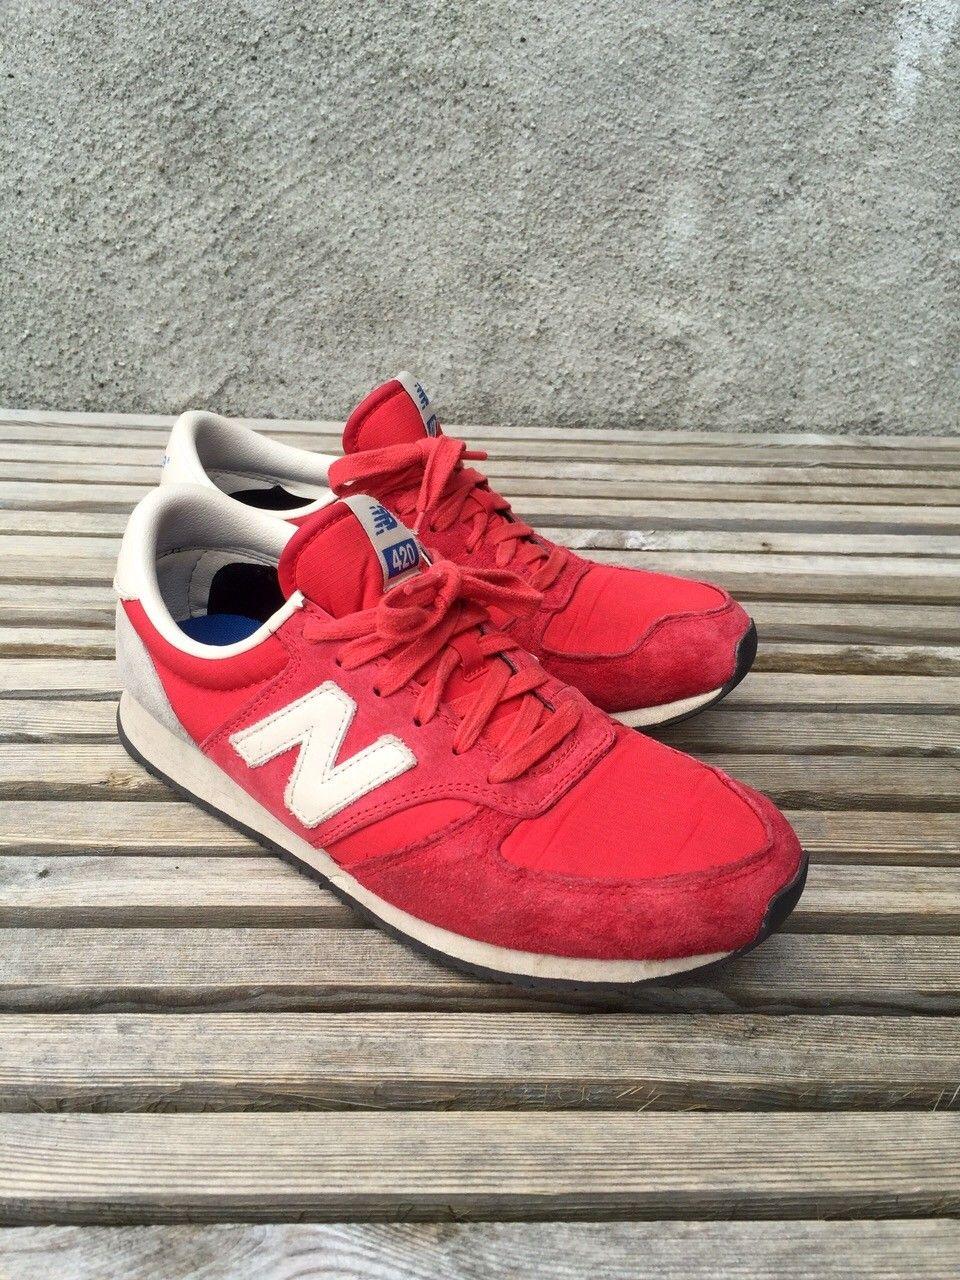 Balance sko - Farsund  - Røde 420 Balance sko i str 38,5. Nesten ubrukt. Eventuell frakt kommer i tillegg. - Farsund